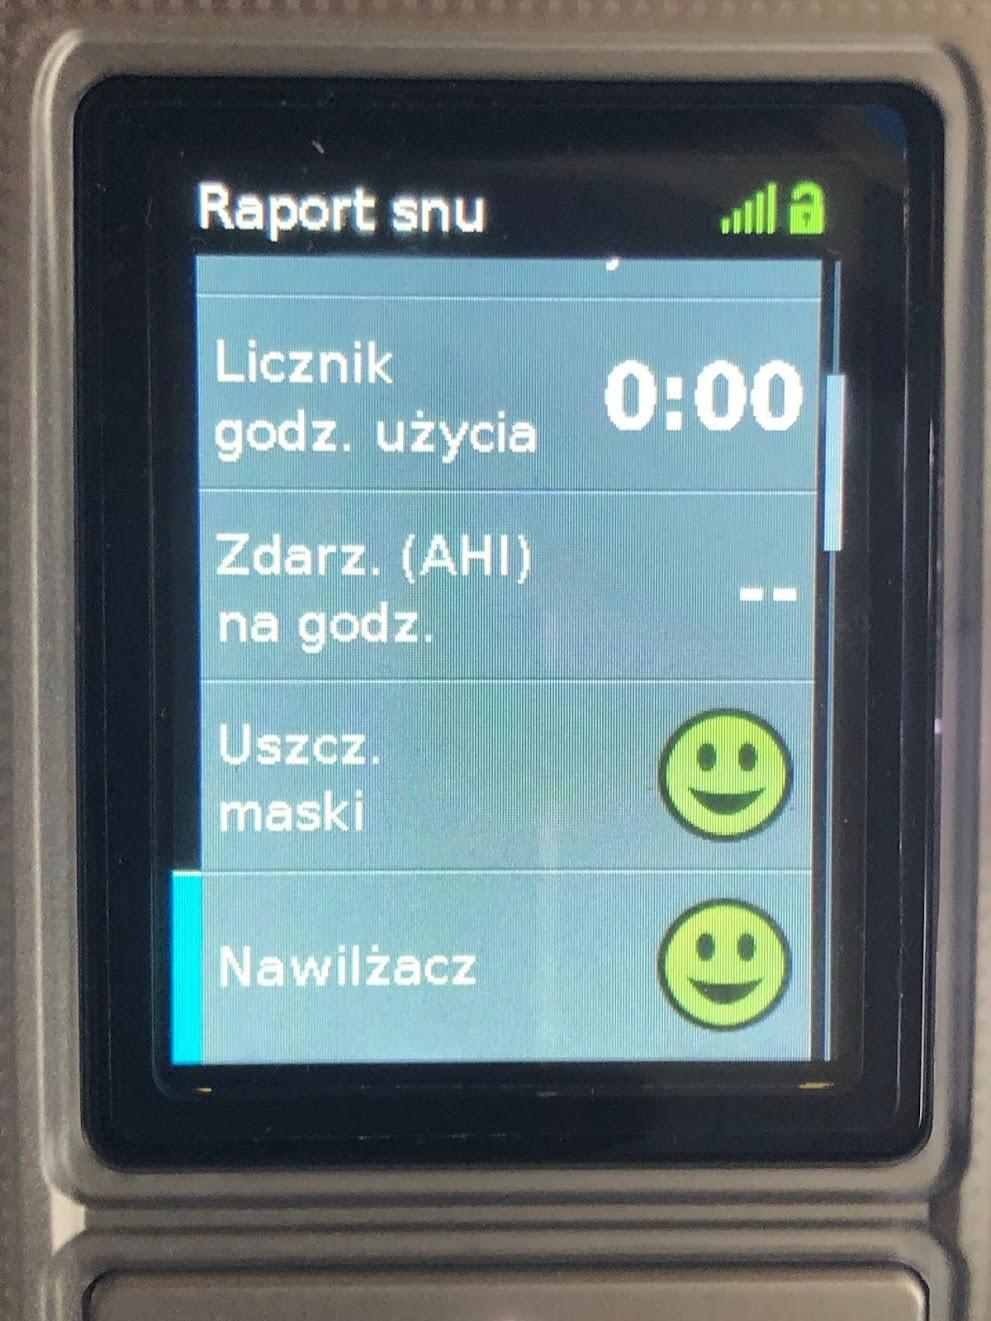 Raport snu w Resmed AirSense/ AirCurve